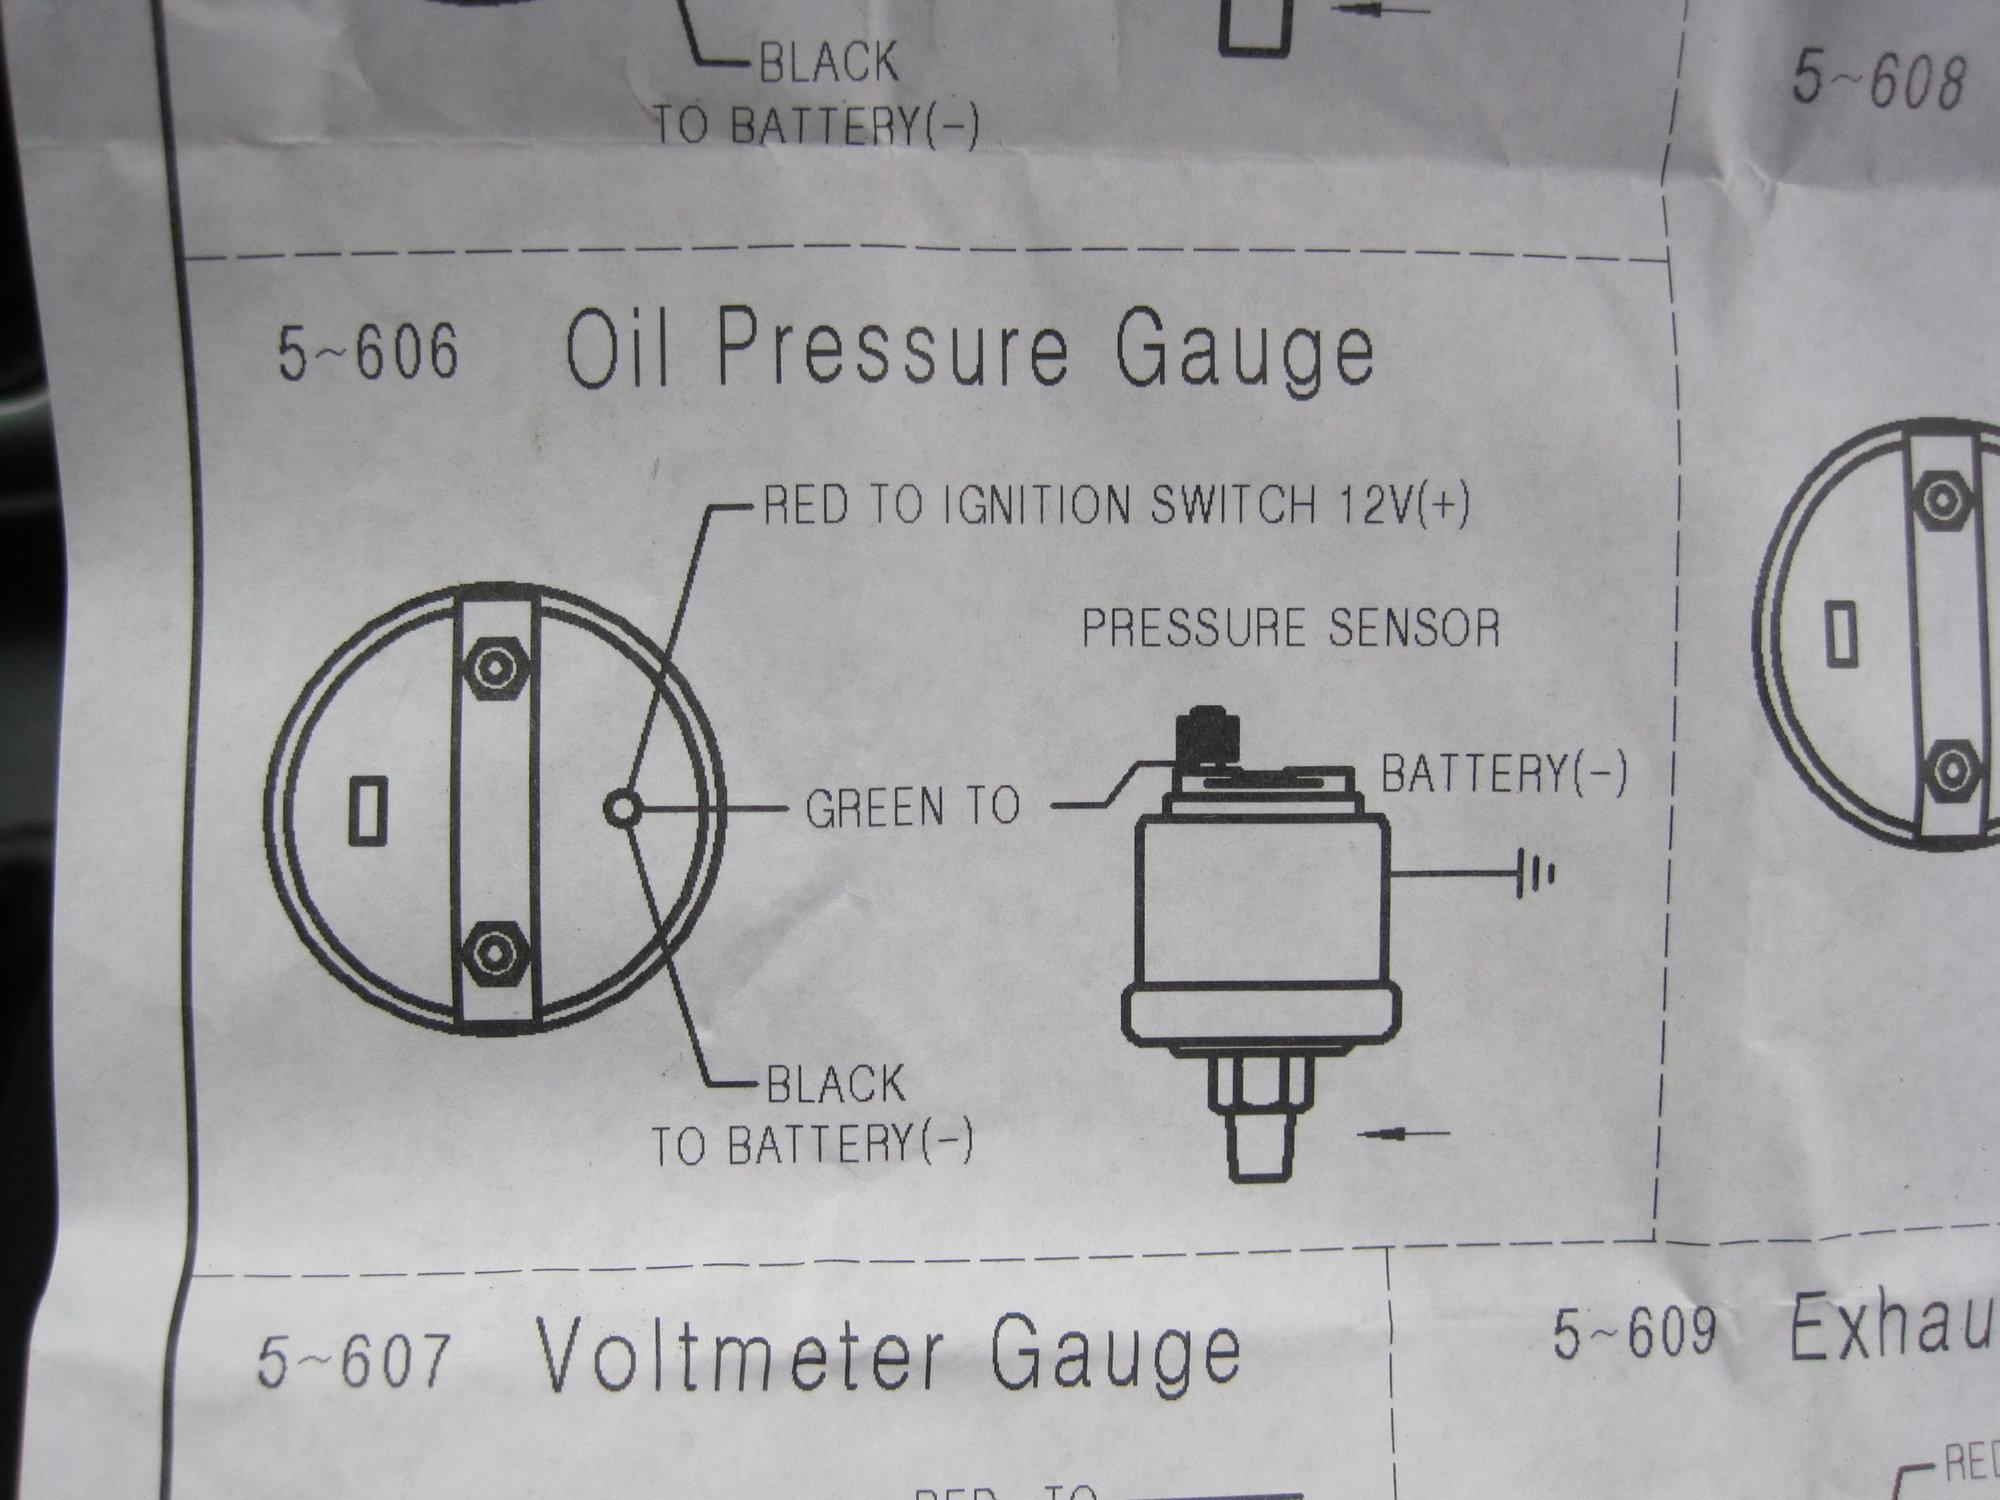 Dragon Gauge Oil Pressure Wiring Diagram - Murray Switch Wiring Diagram -  contuor.corolla.waystar.fr | Dragon Boost Gauge Wiring Diagram |  | Wiring Diagram Resource